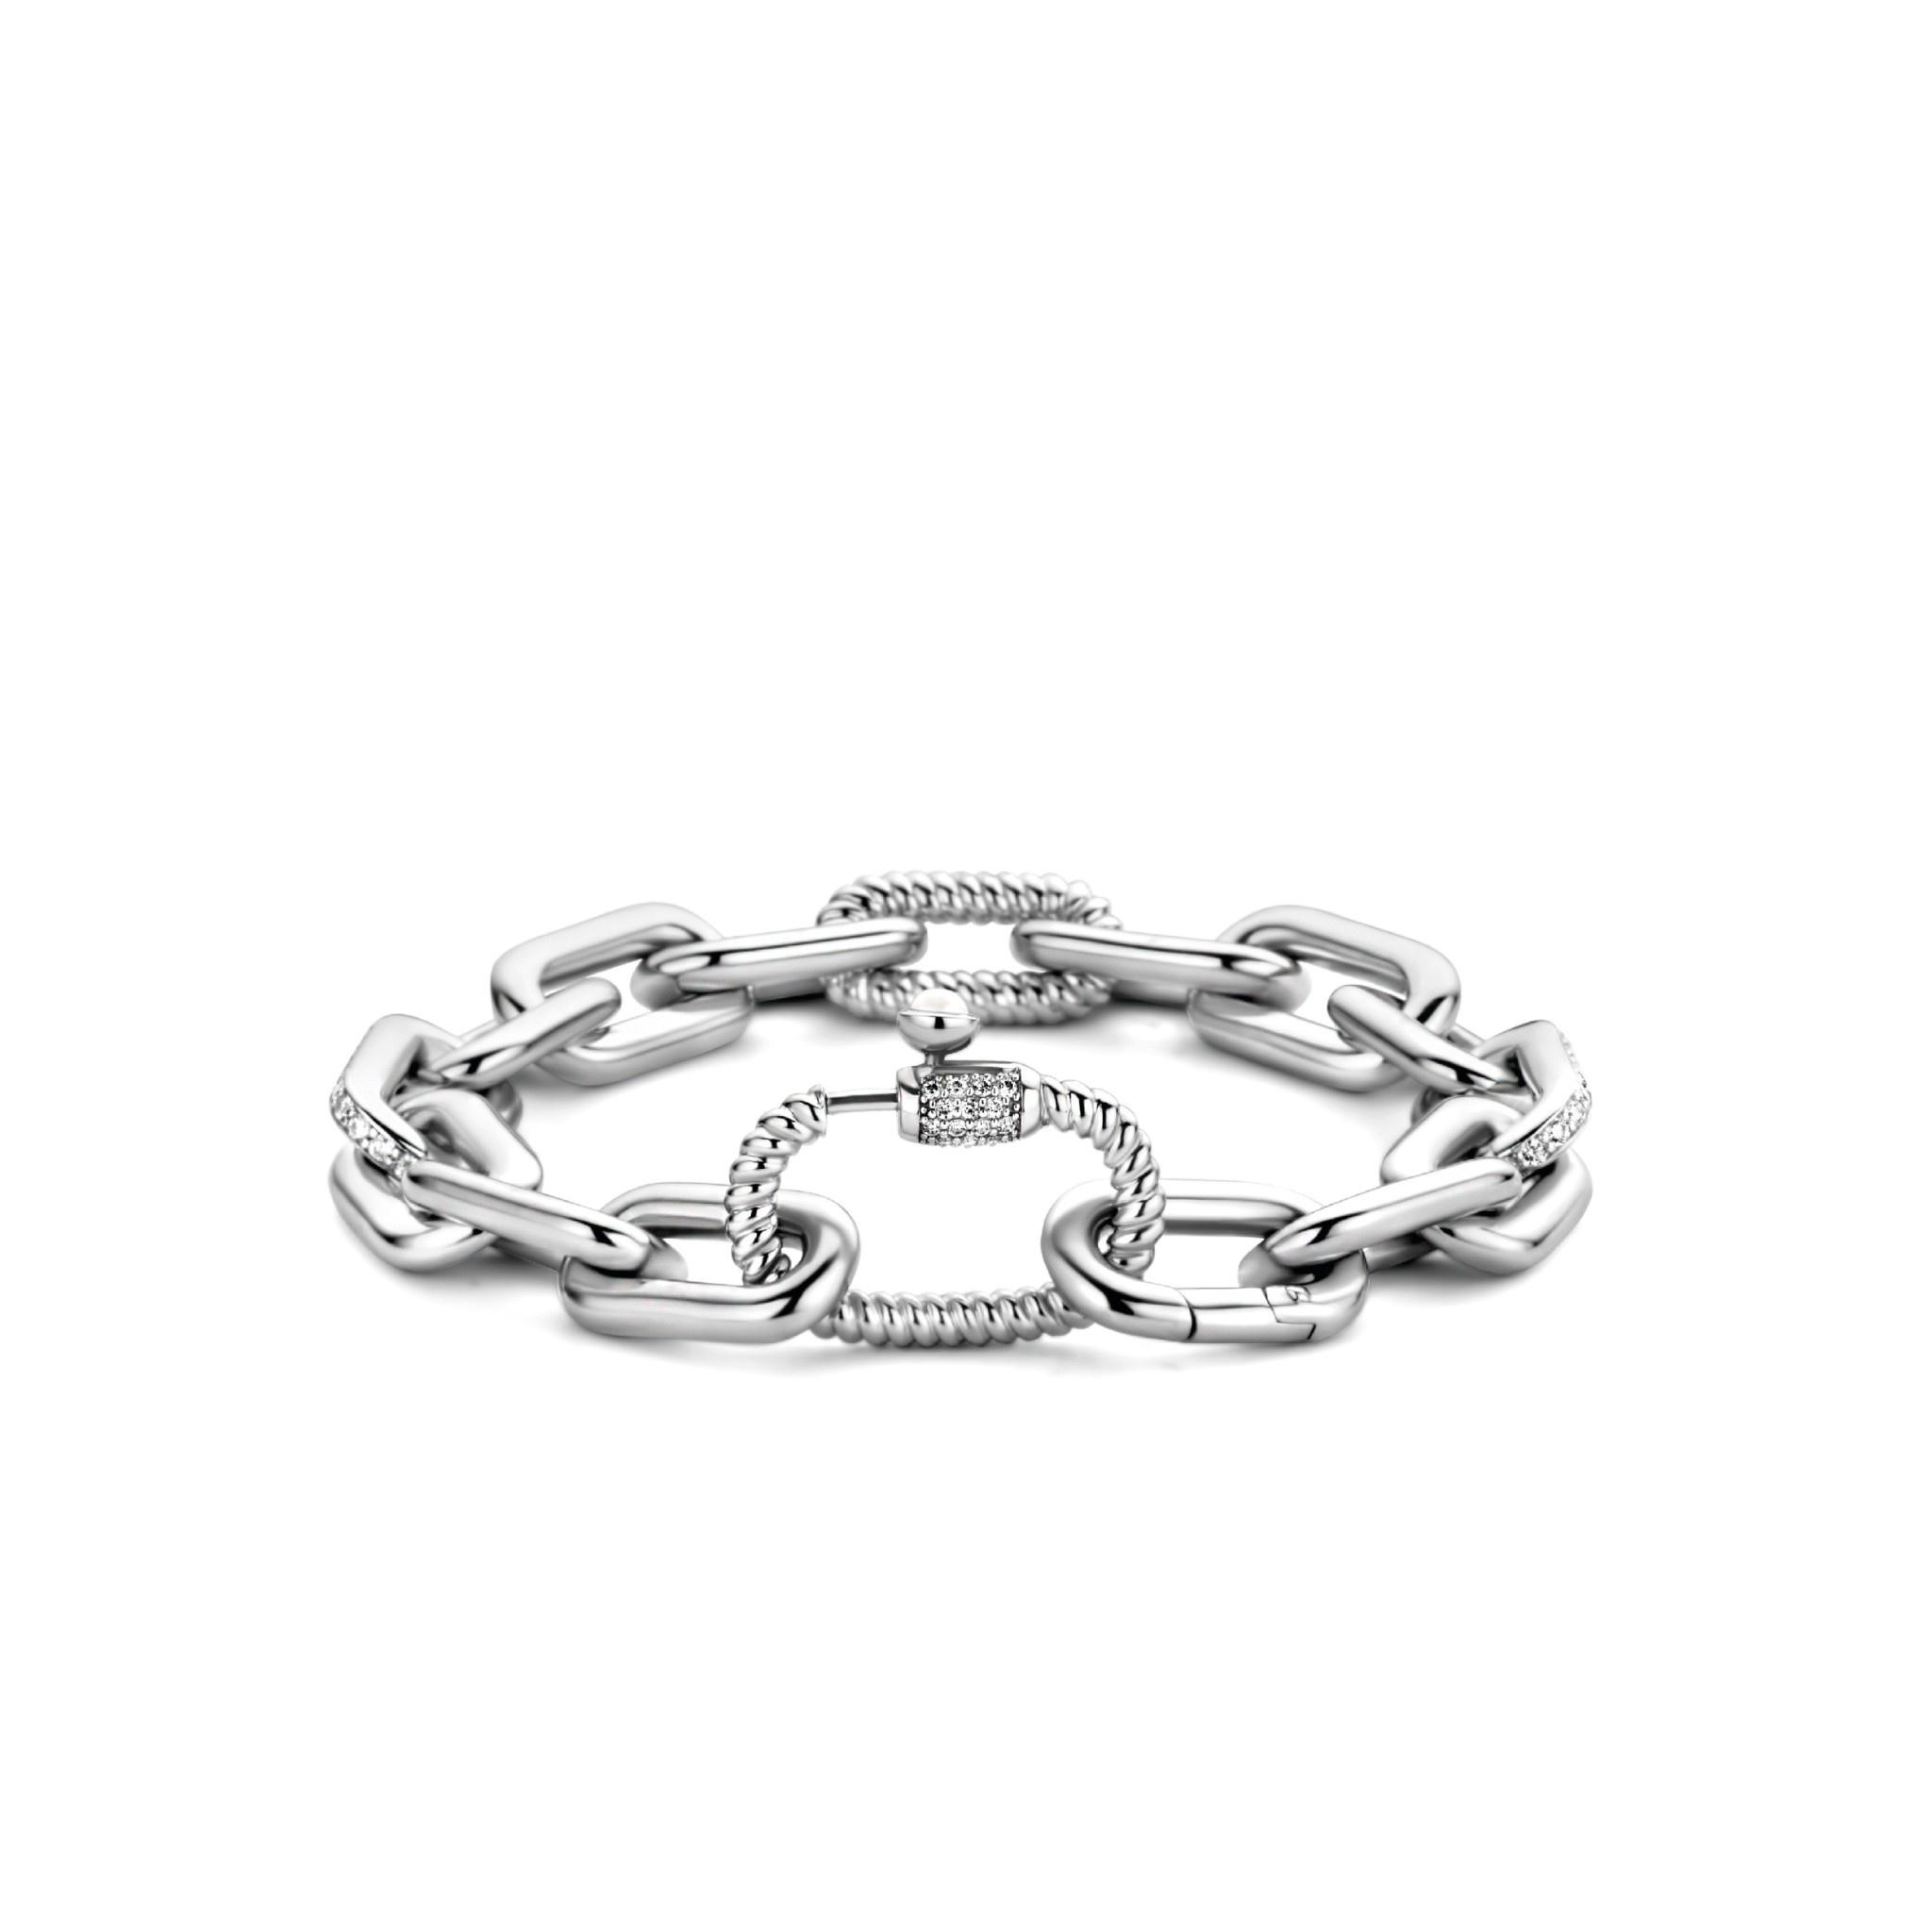 TI SENTO - Milano Bracelet 2949ZI-1